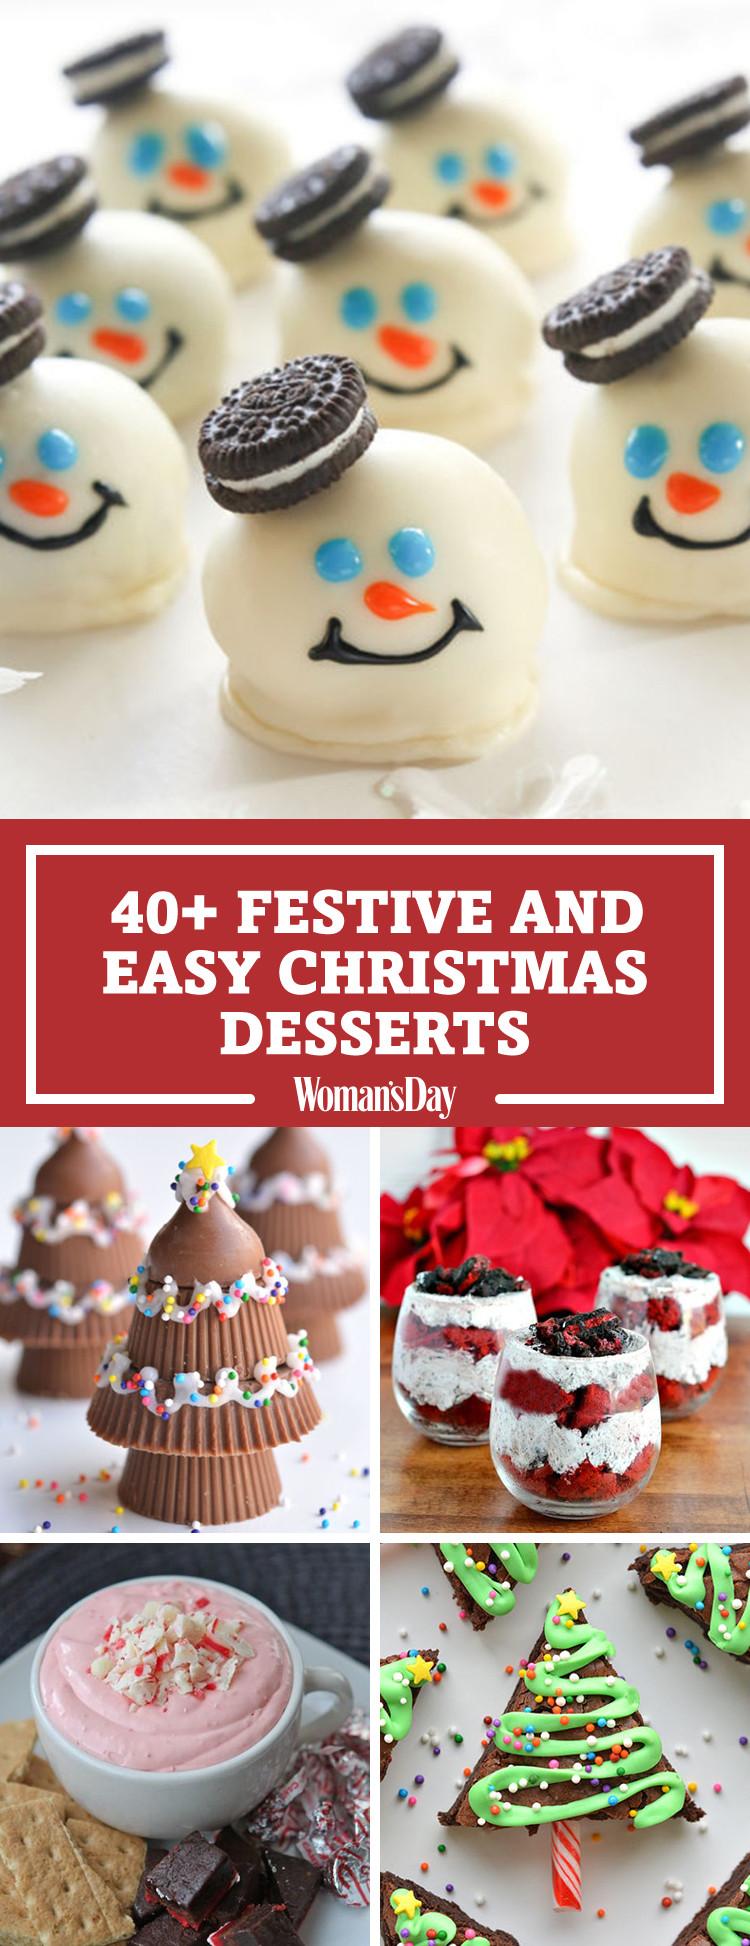 Easy Christmas Dessert Recipes  57 Easy Christmas Dessert Recipes Best Ideas for Fun